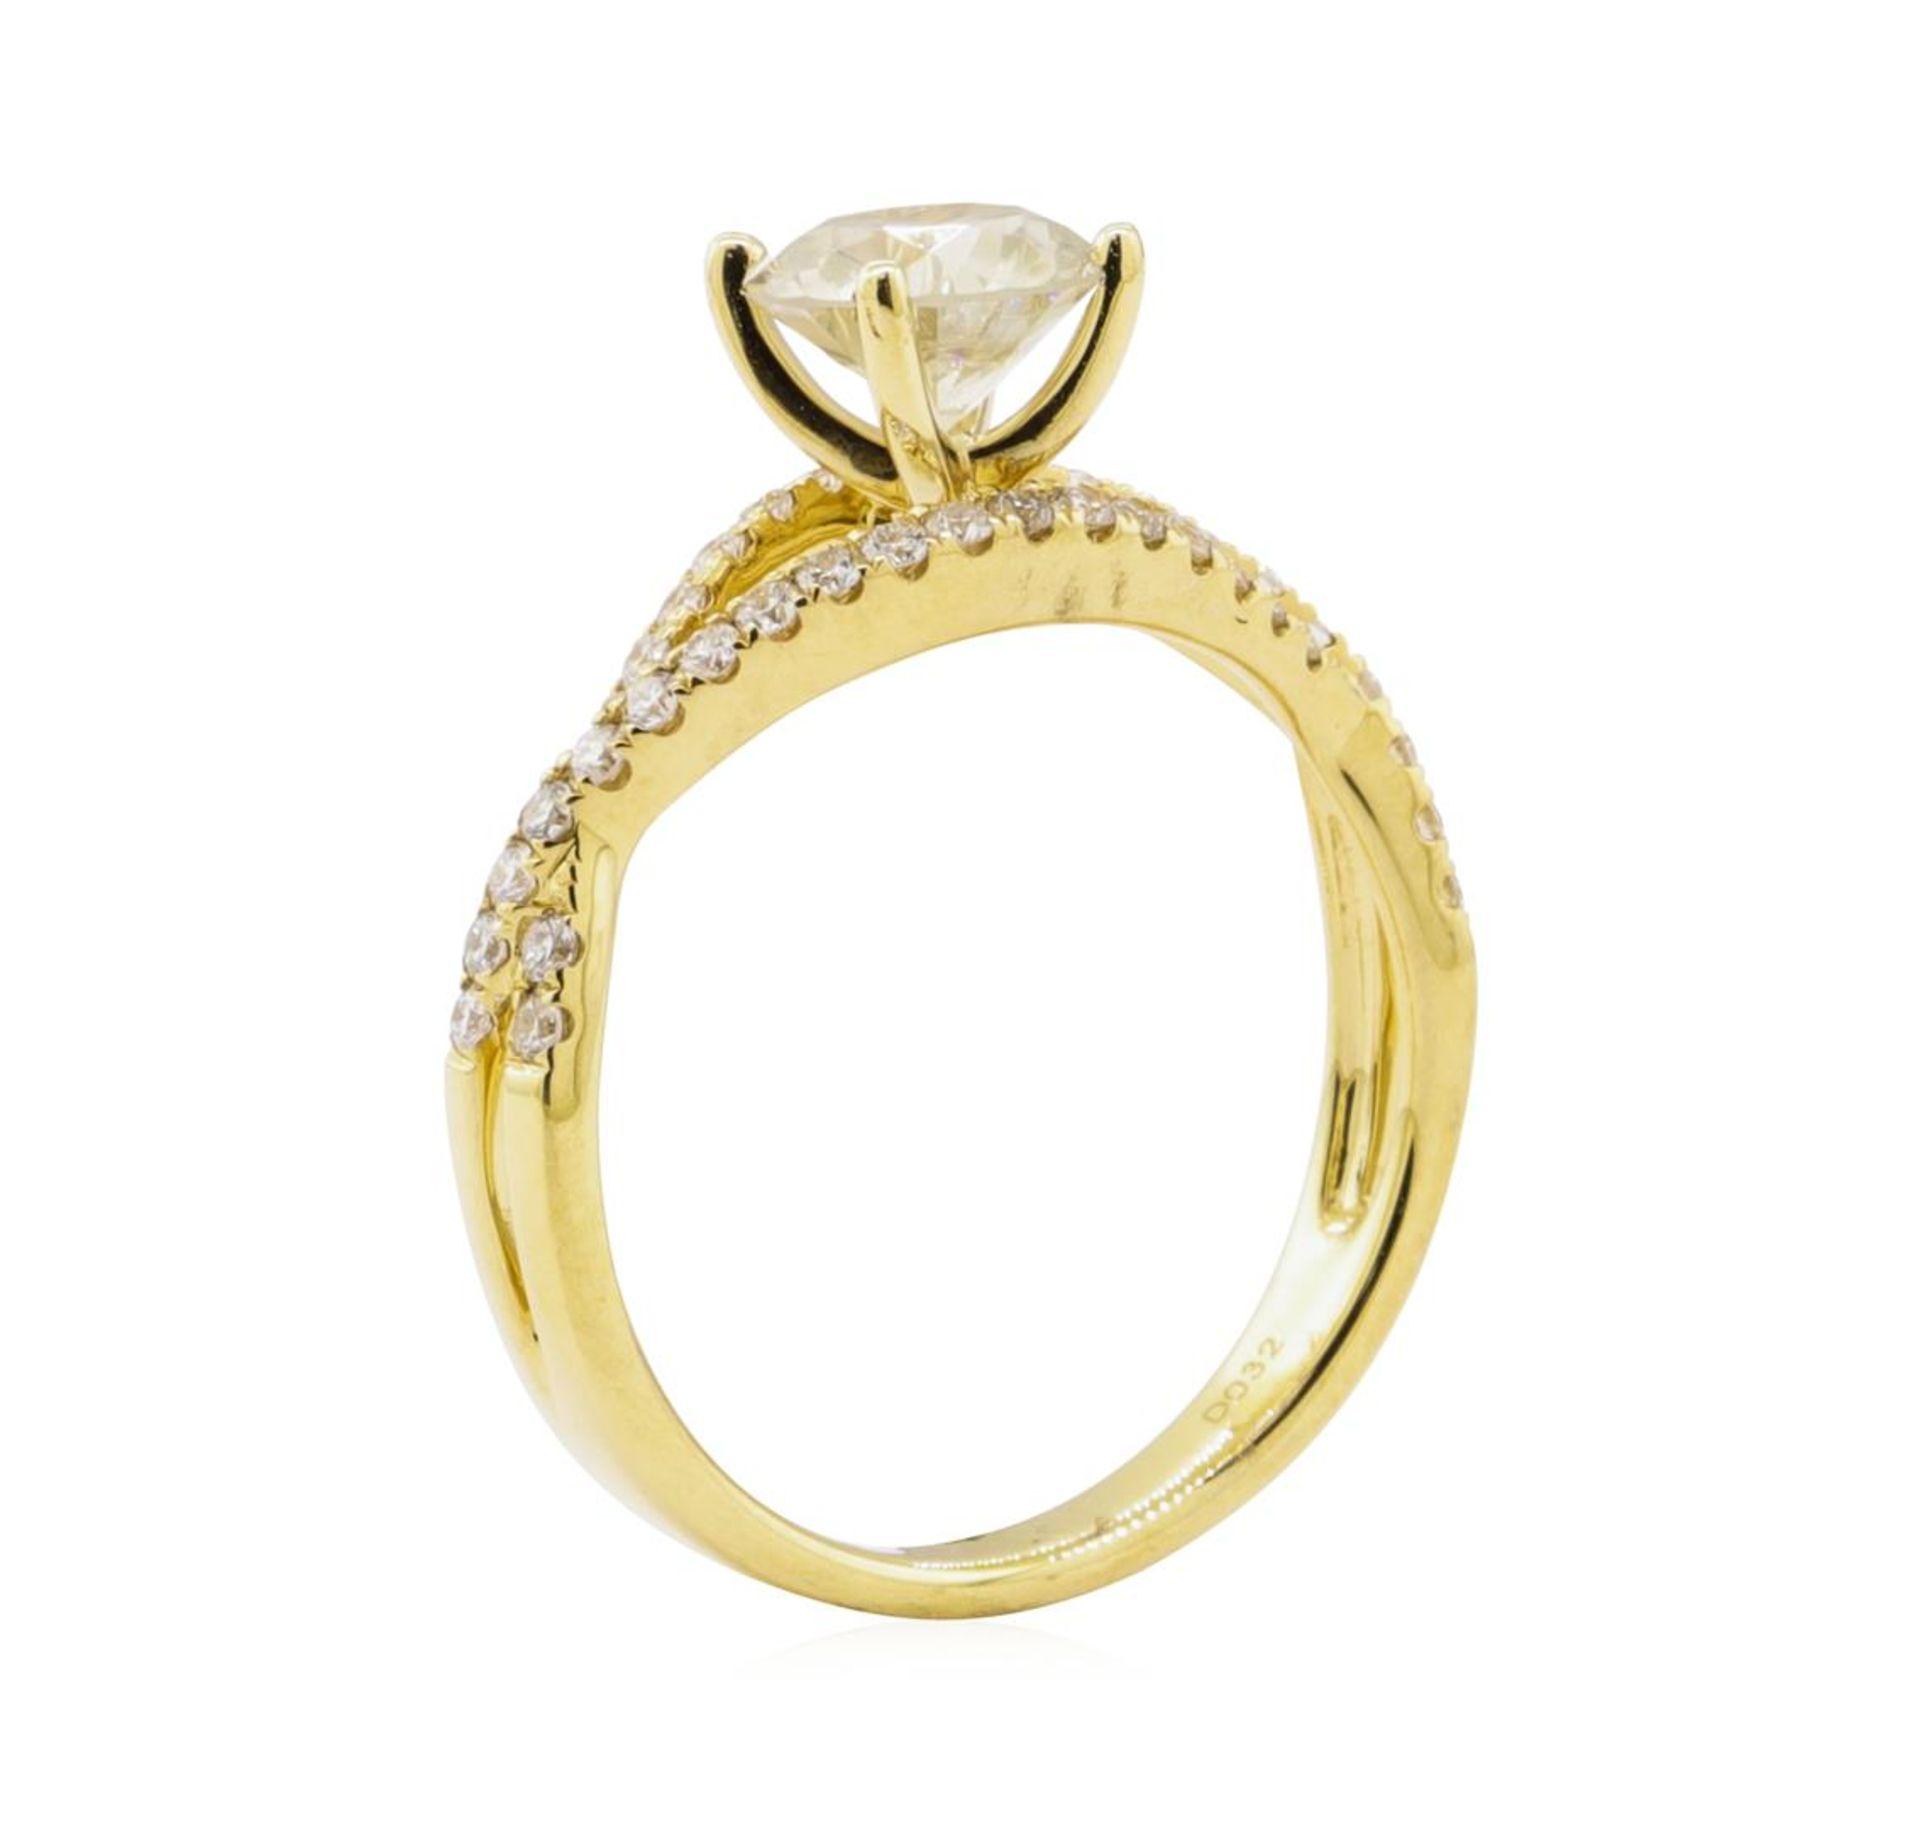 1.04ct Diamond Ring - 18KT Yellow Gold - Image 4 of 5